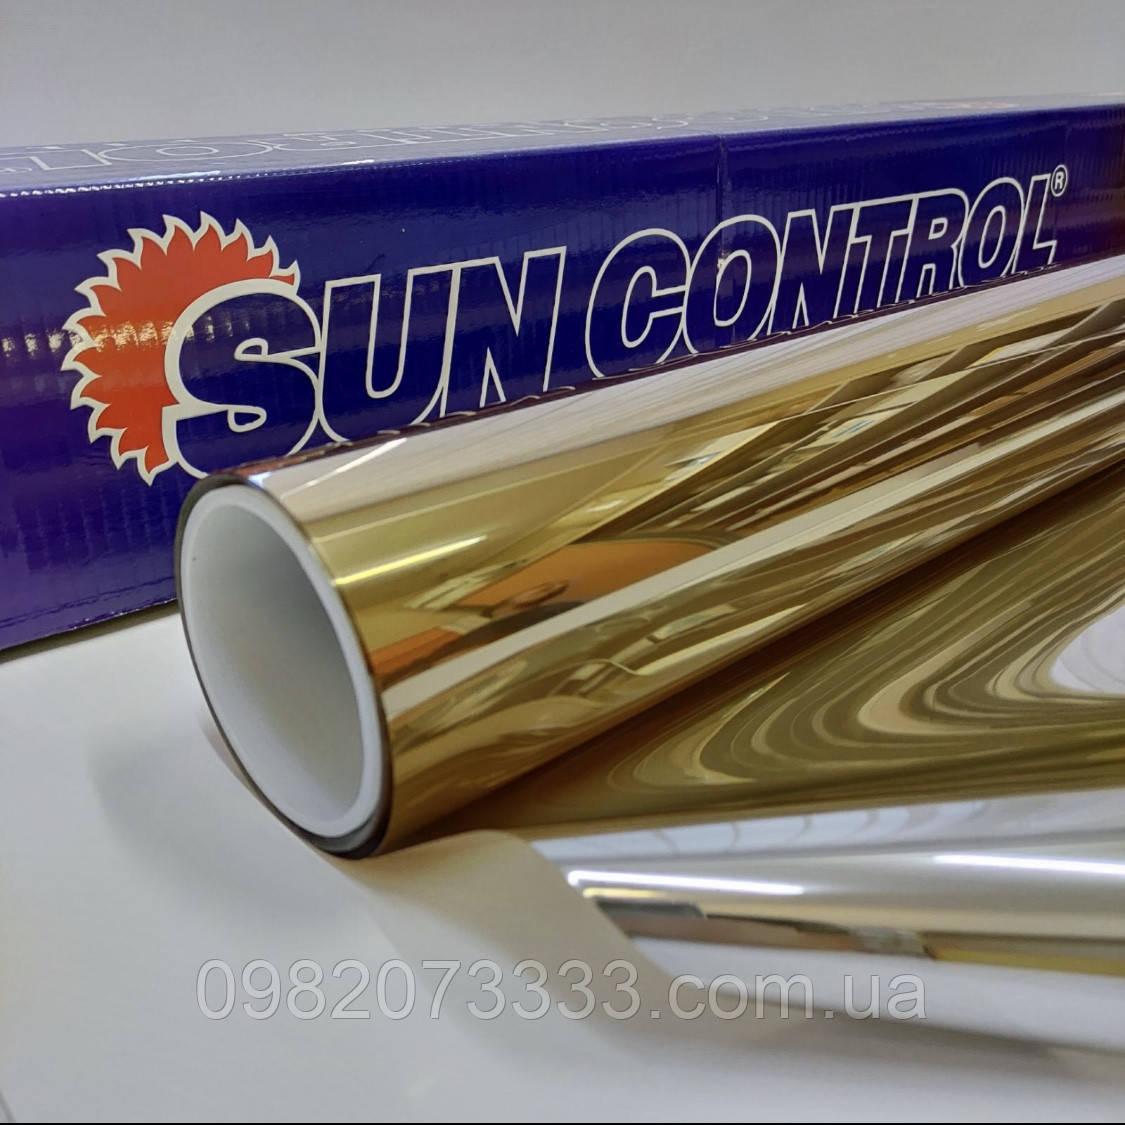 Солнцезащитная R Gold 15 Sun Control зеркальная плёнка для тонировки стекла ширина рулона 1,830 (цена за кв.м)